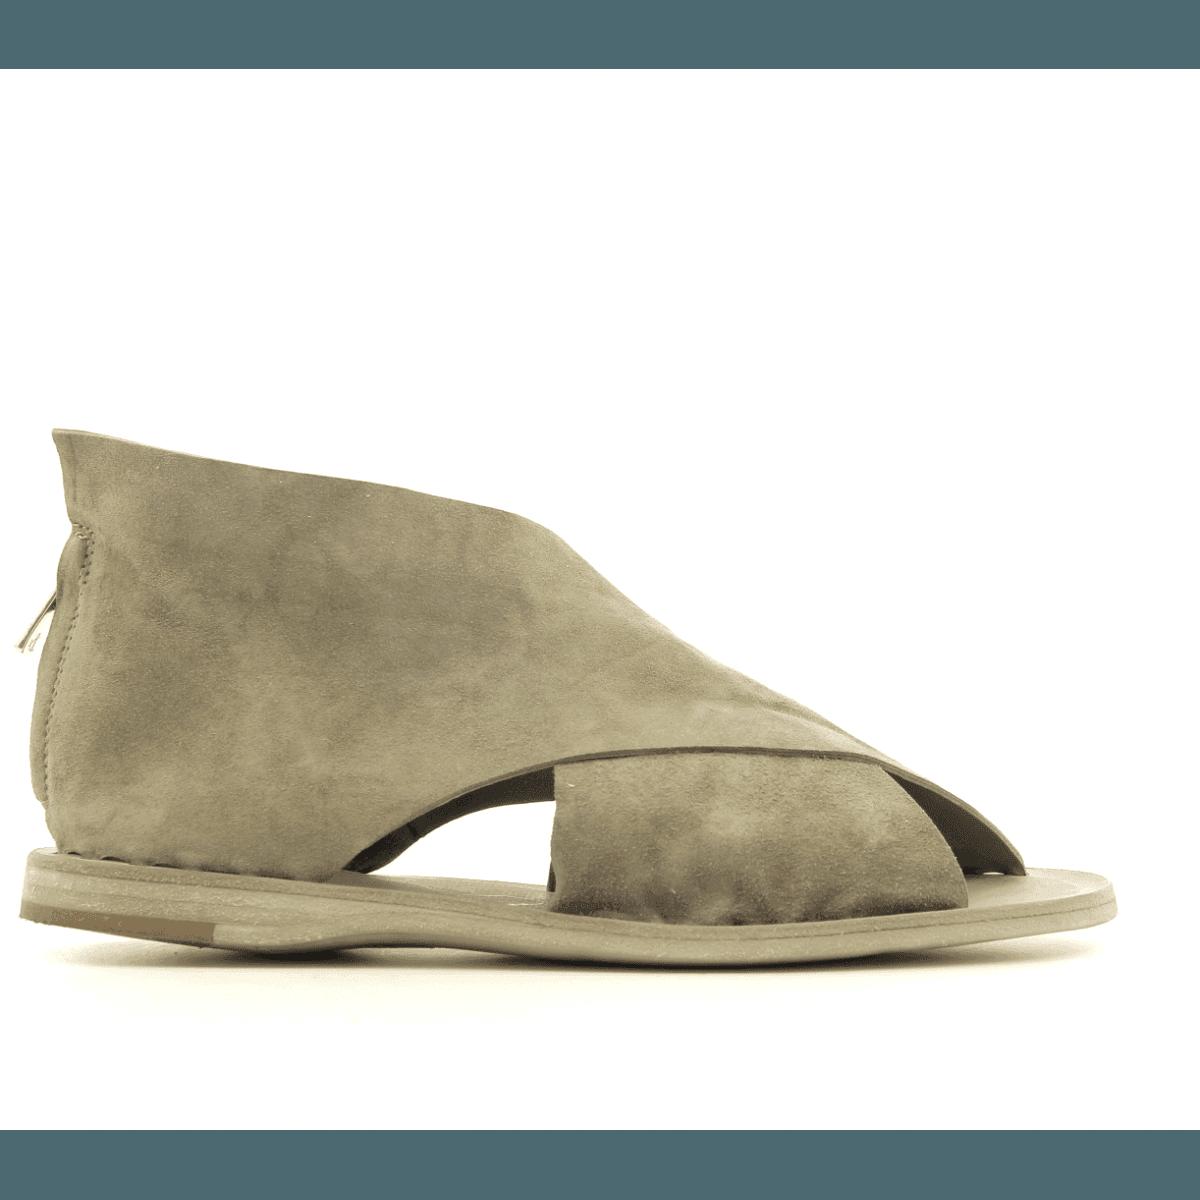 Sandales en veau velours taupe kaki Officine Creative - ITACA 006 KAKI